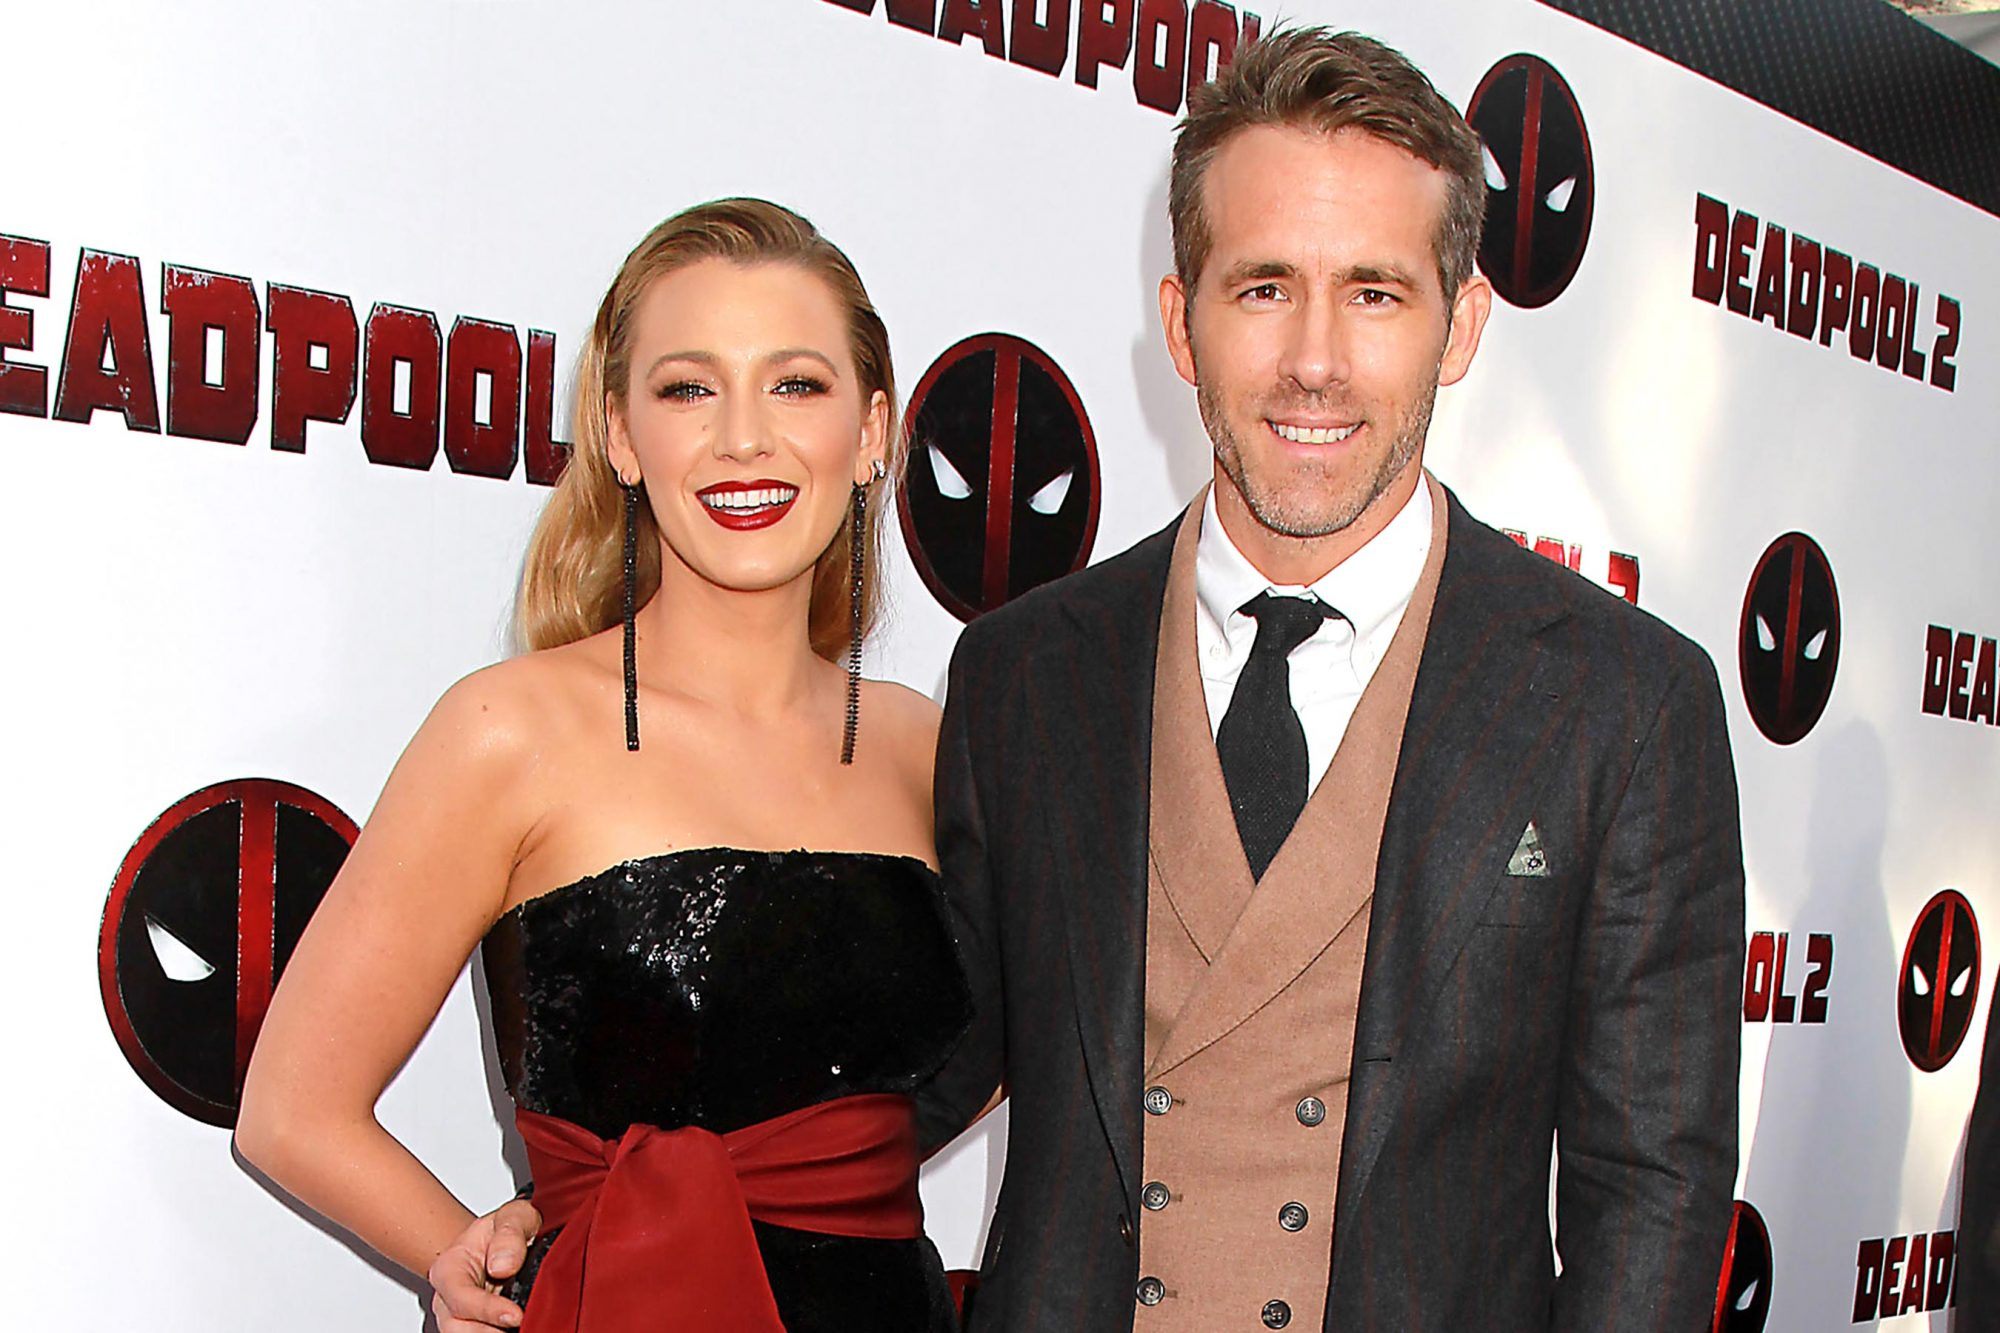 Twentieth Century Fox Presents a Special Screening of 'Deadpool 2', New York, USA - 14 May 2018